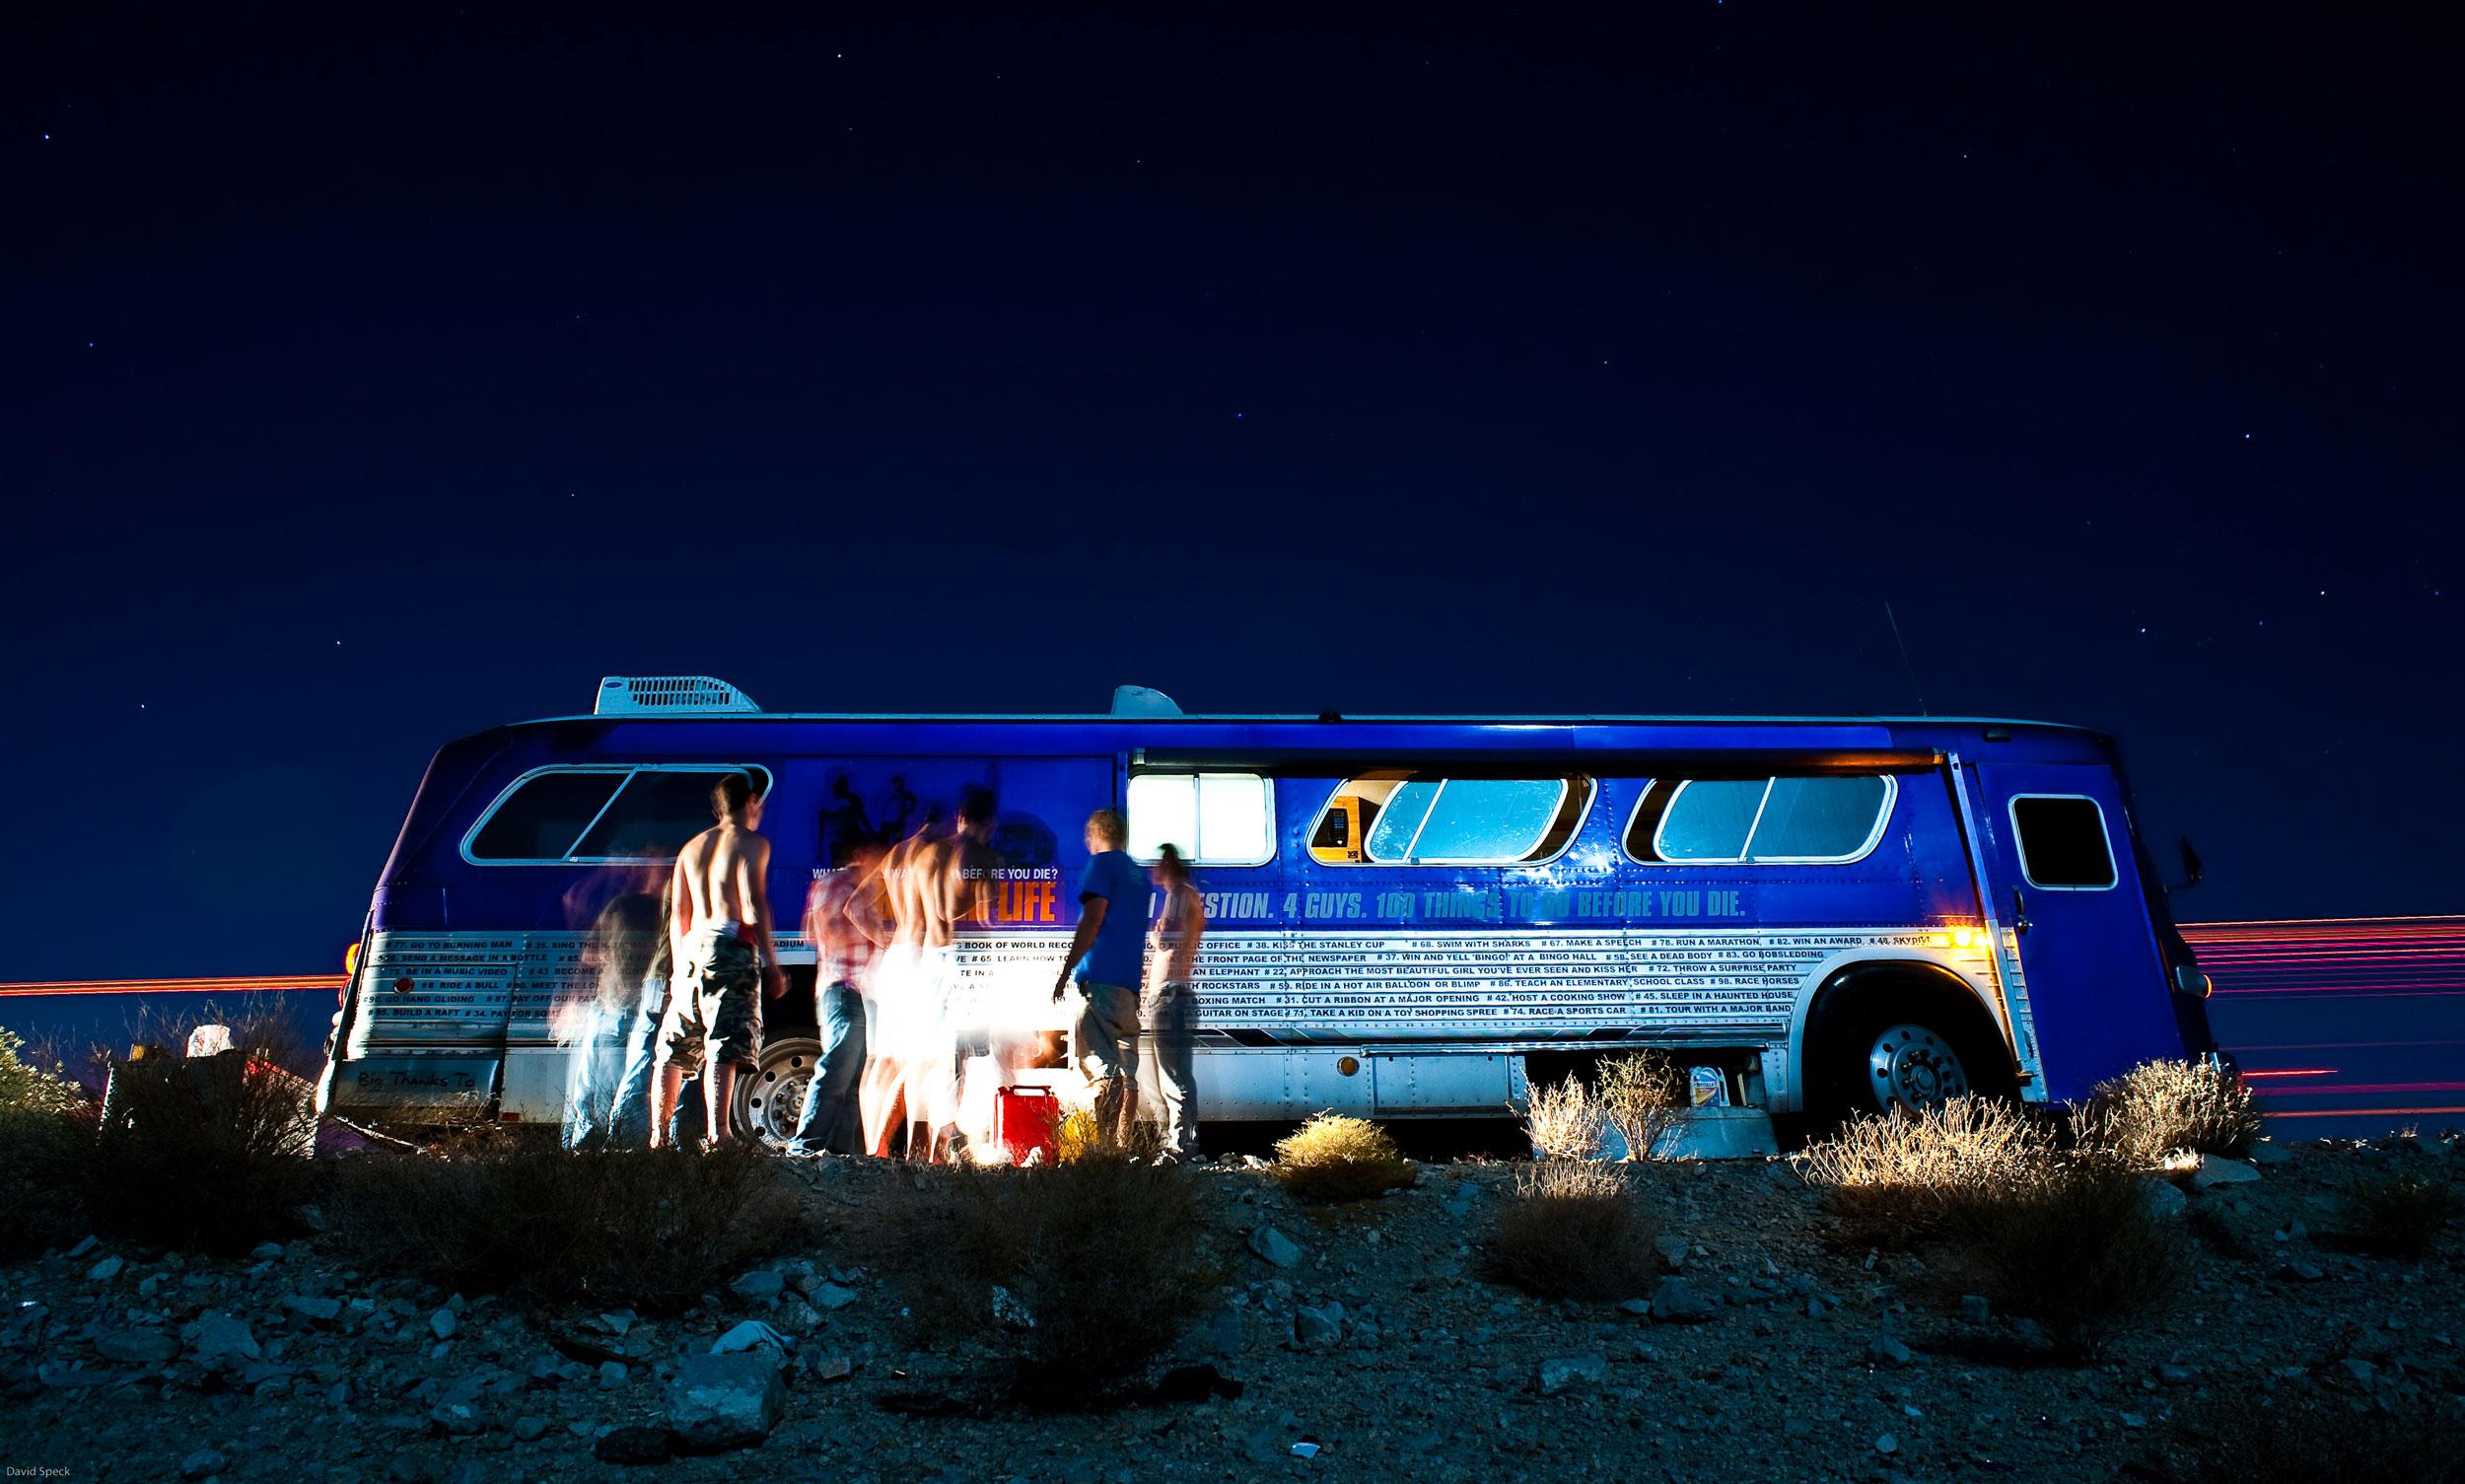 TBL-Bus-Night.jpg